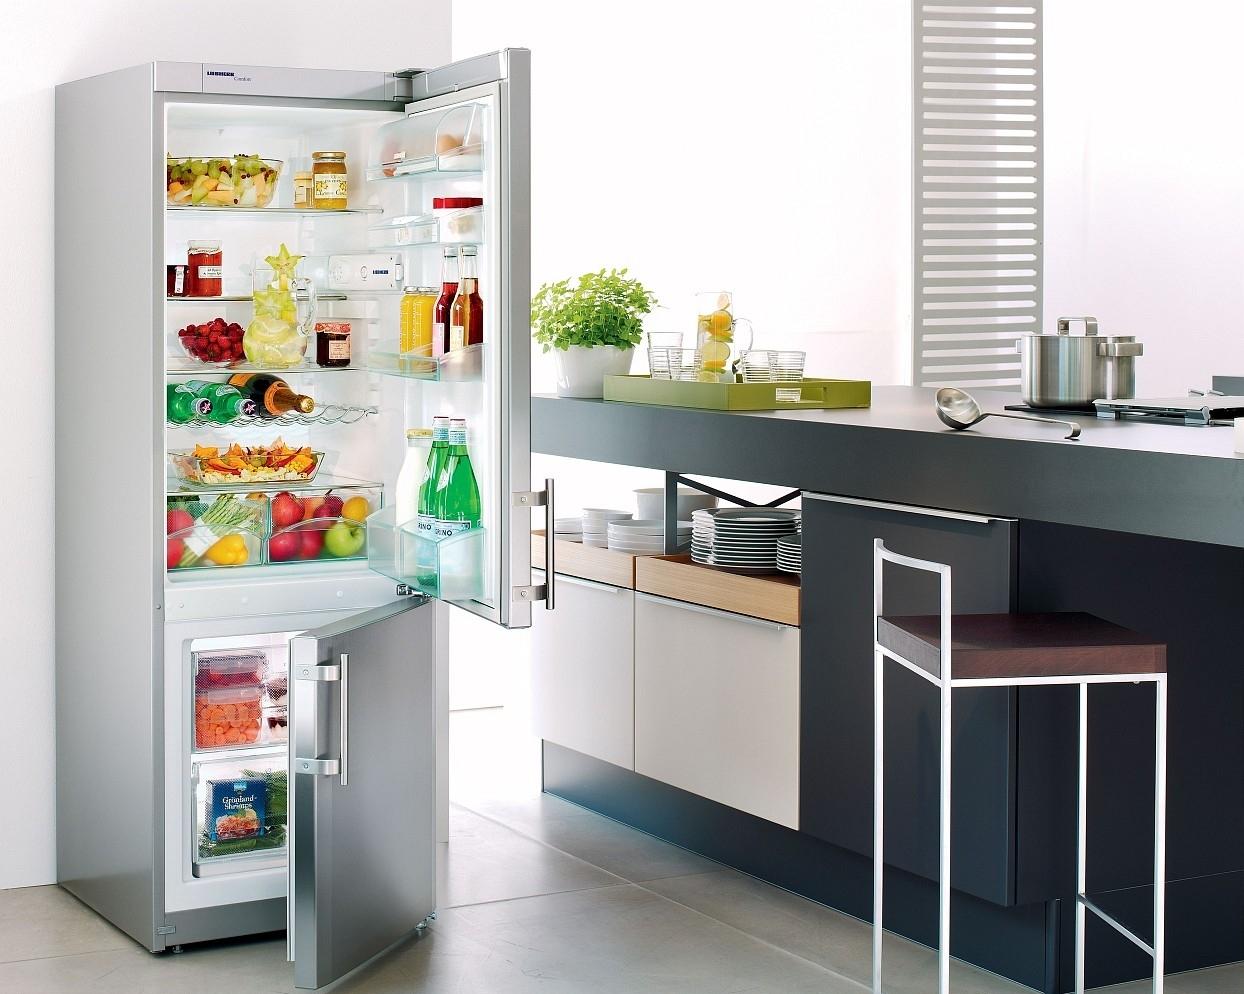 Картинка холодильник на кухне